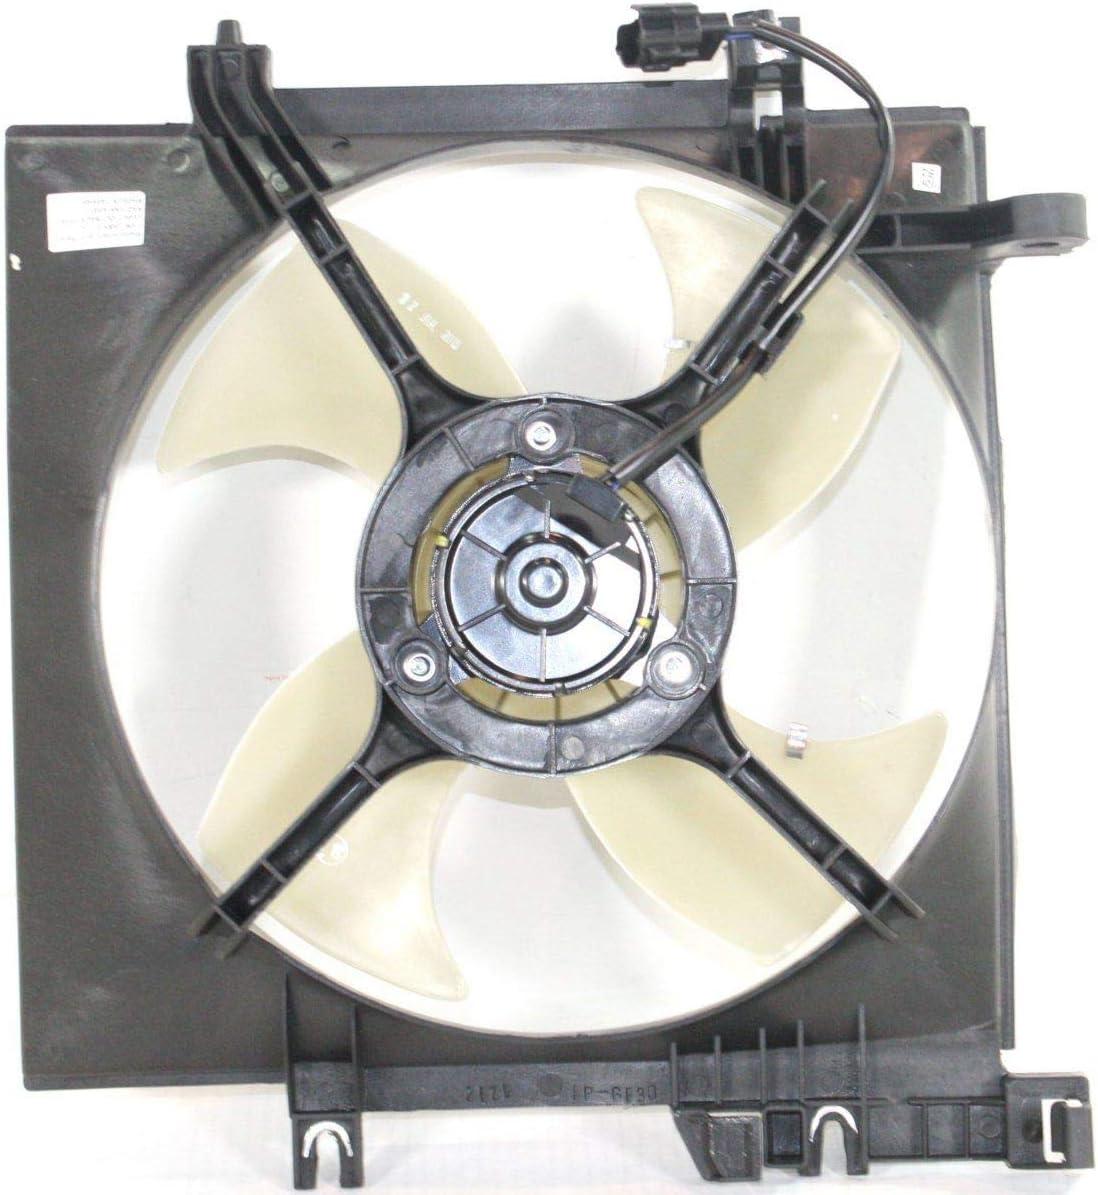 Radiator Cooling Fan For 2005-2014 Subaru Outback 2007-2014 Legacy Left Side